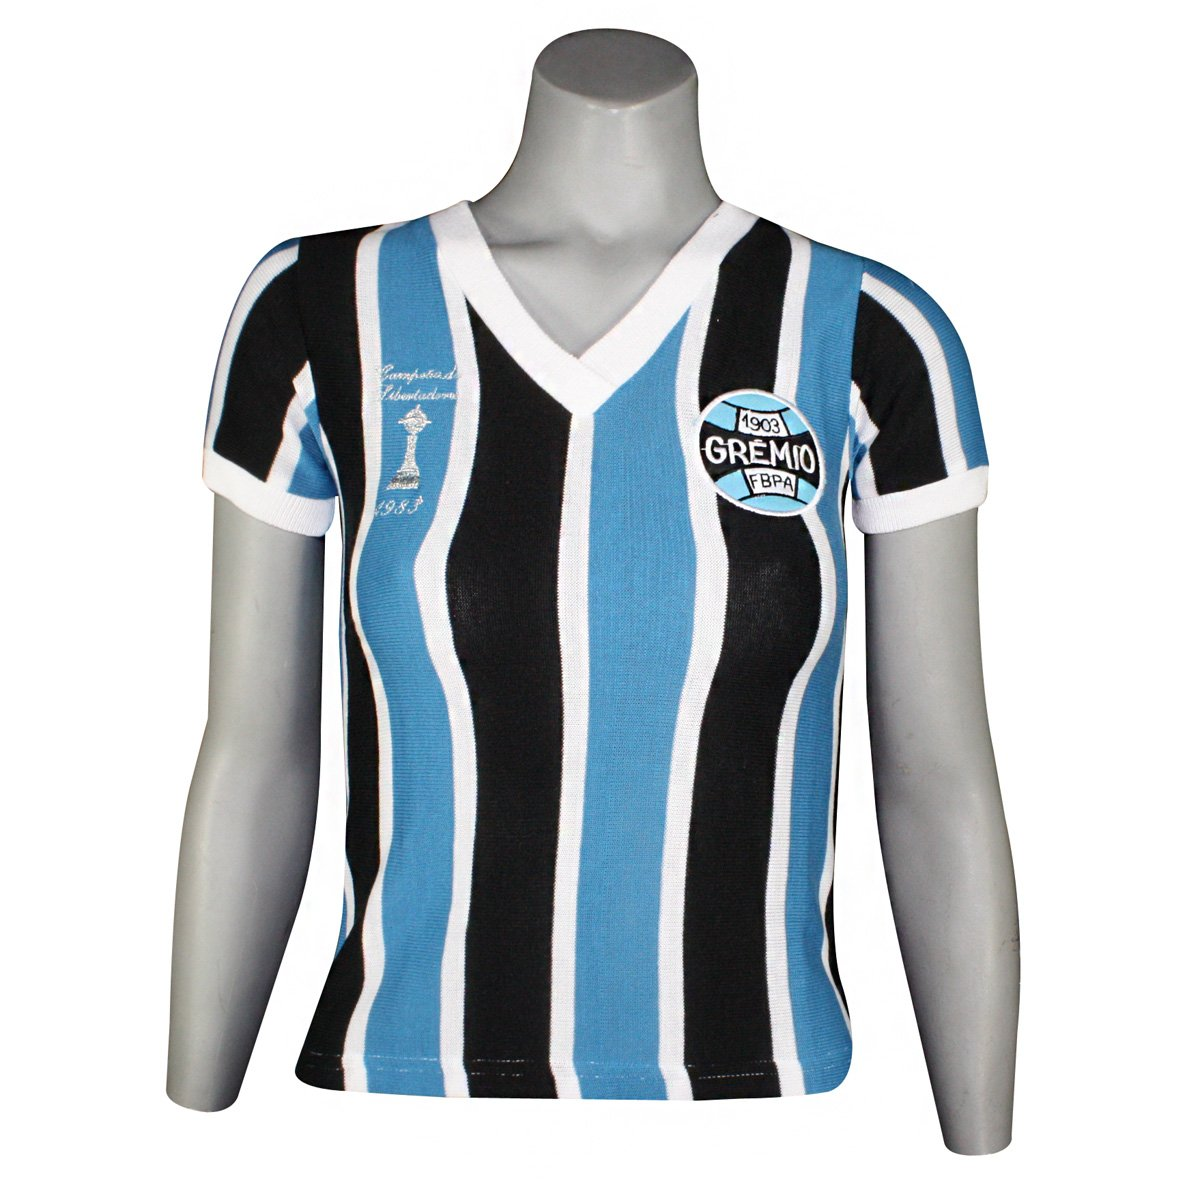 0931f630c620d Camisa Feminina Dilva Oldoni Grêmio Retro Renato Gaúcho GLIBB Tricolor